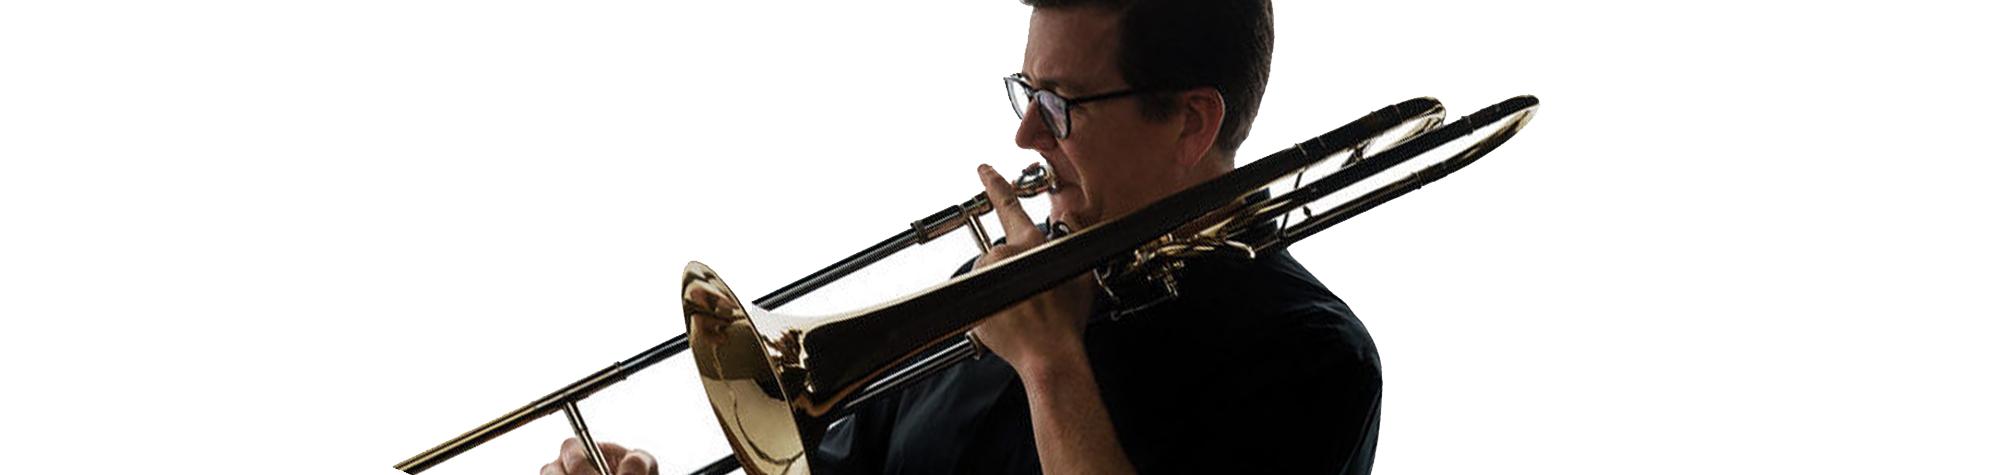 Timothy Higgins Trombone Interview – Trombone Corner #11